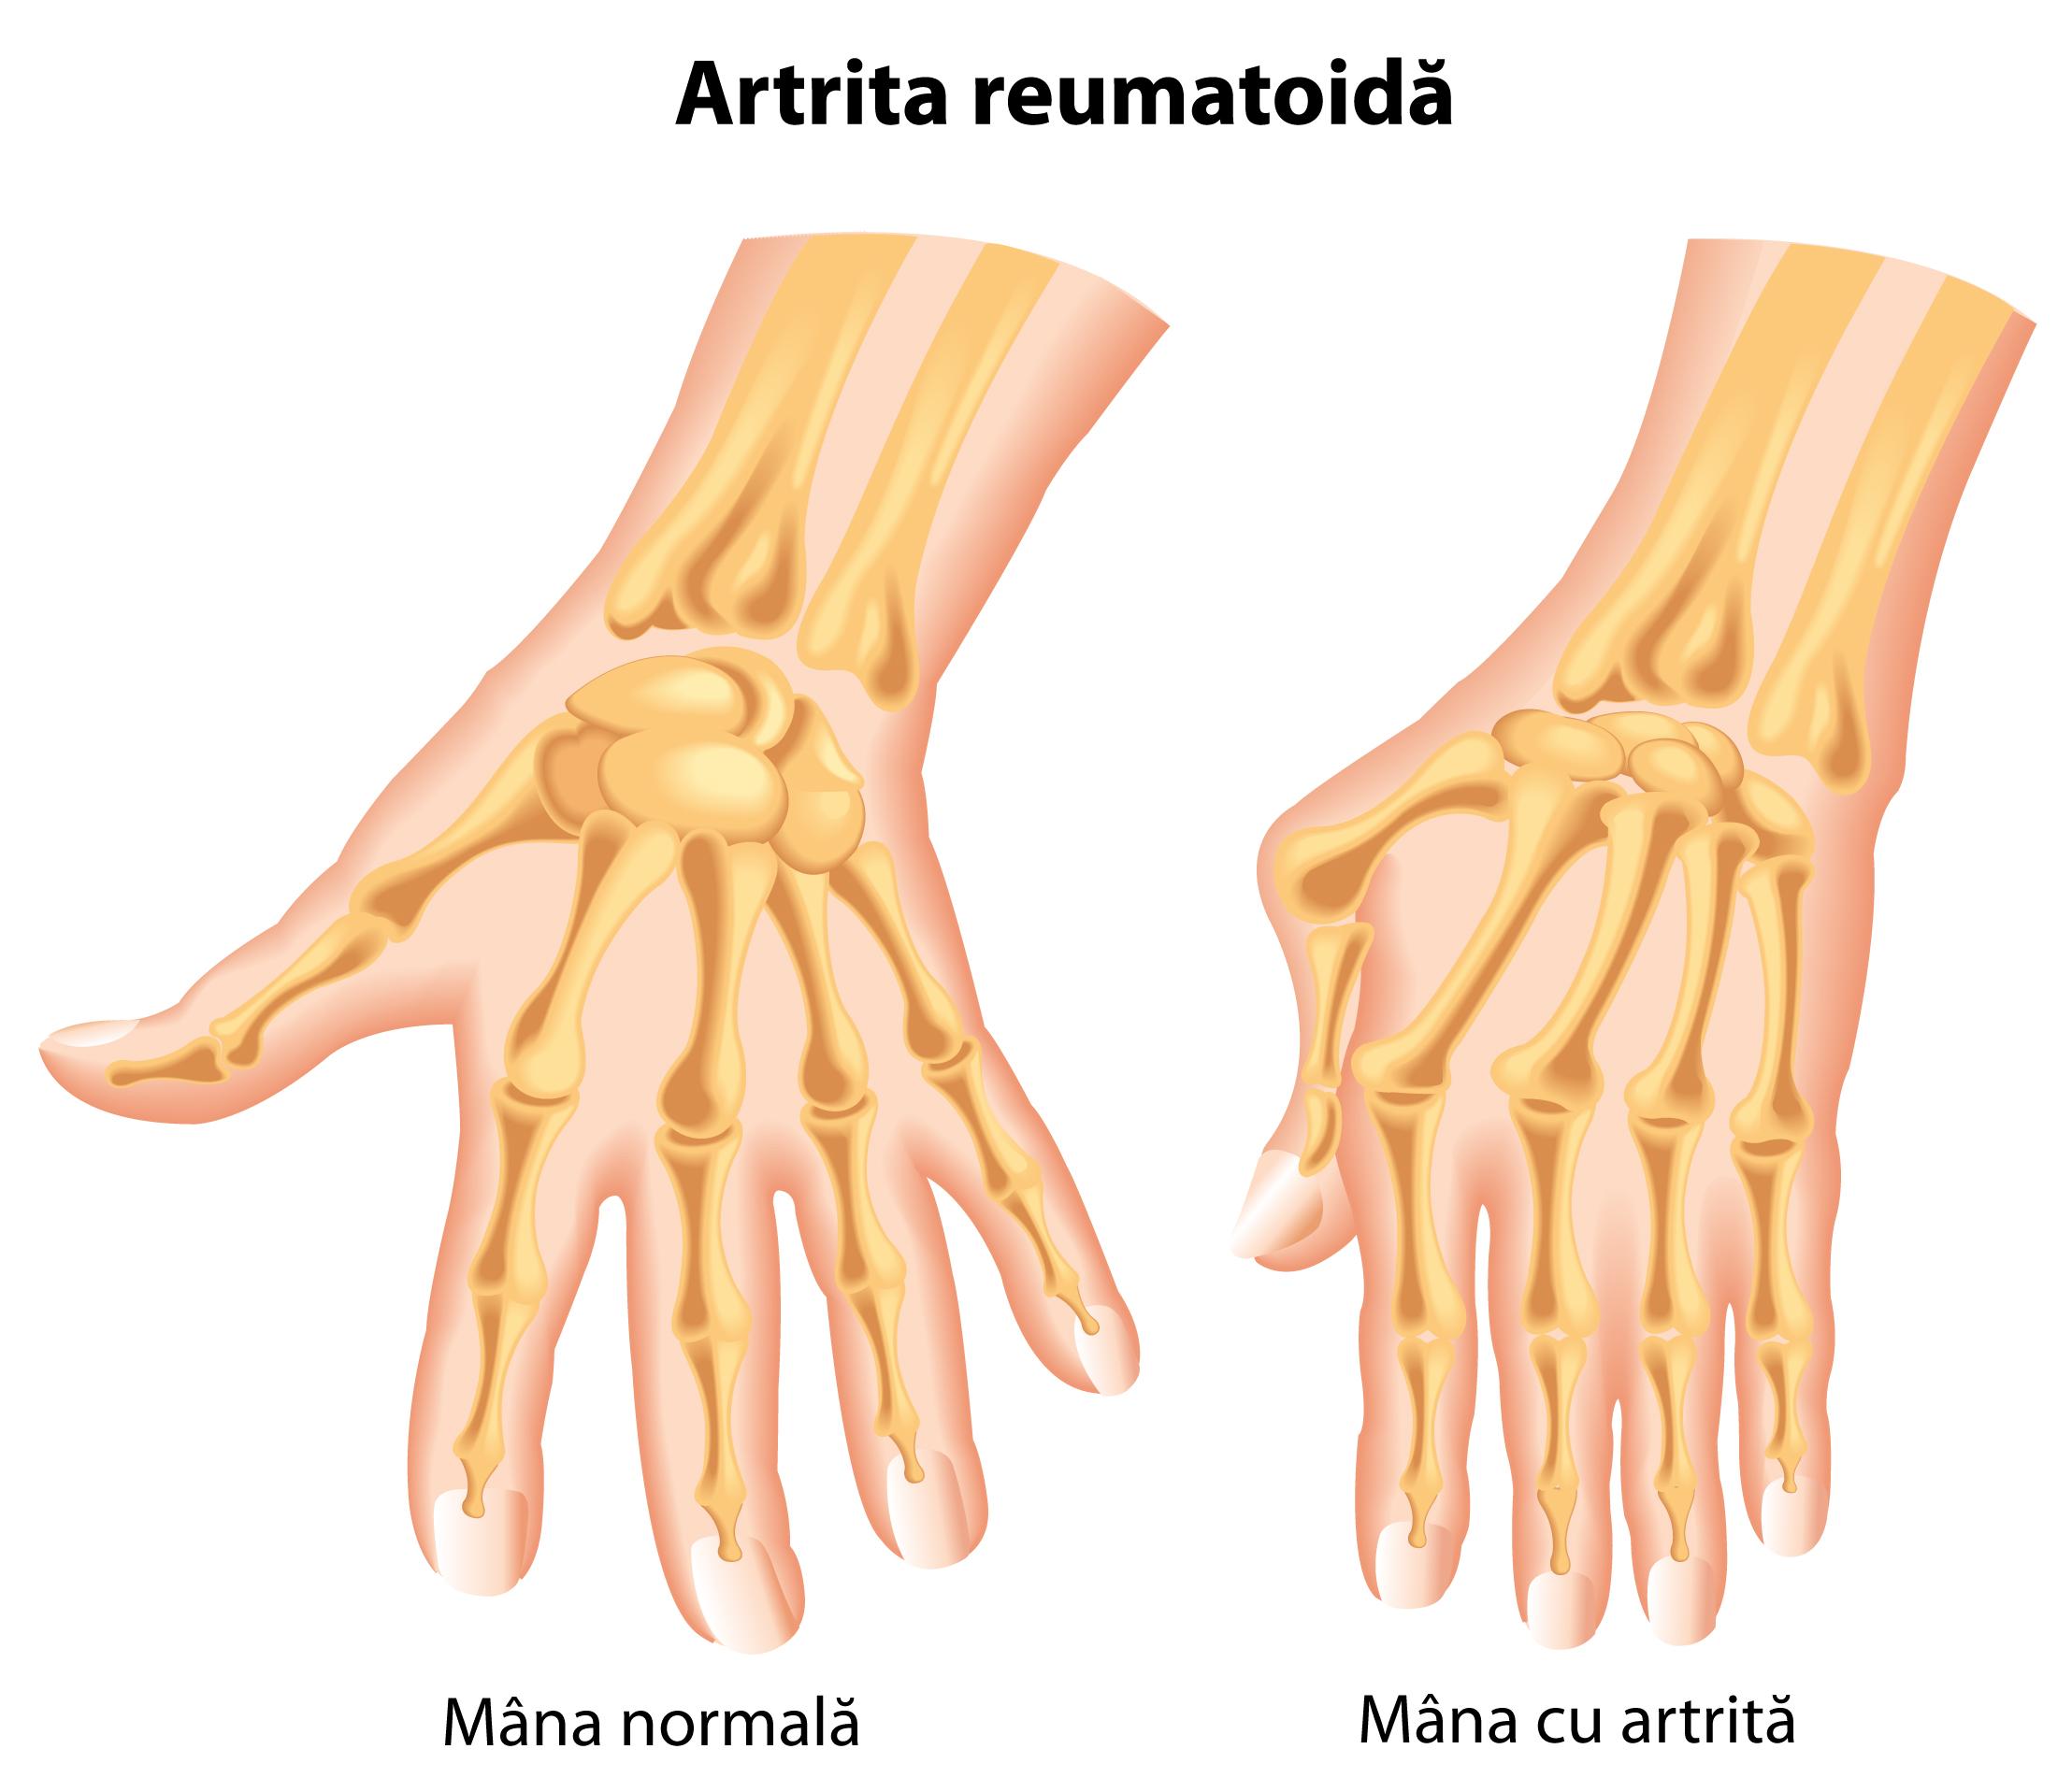 Poliartrita reumatoida | blumenonline.ro